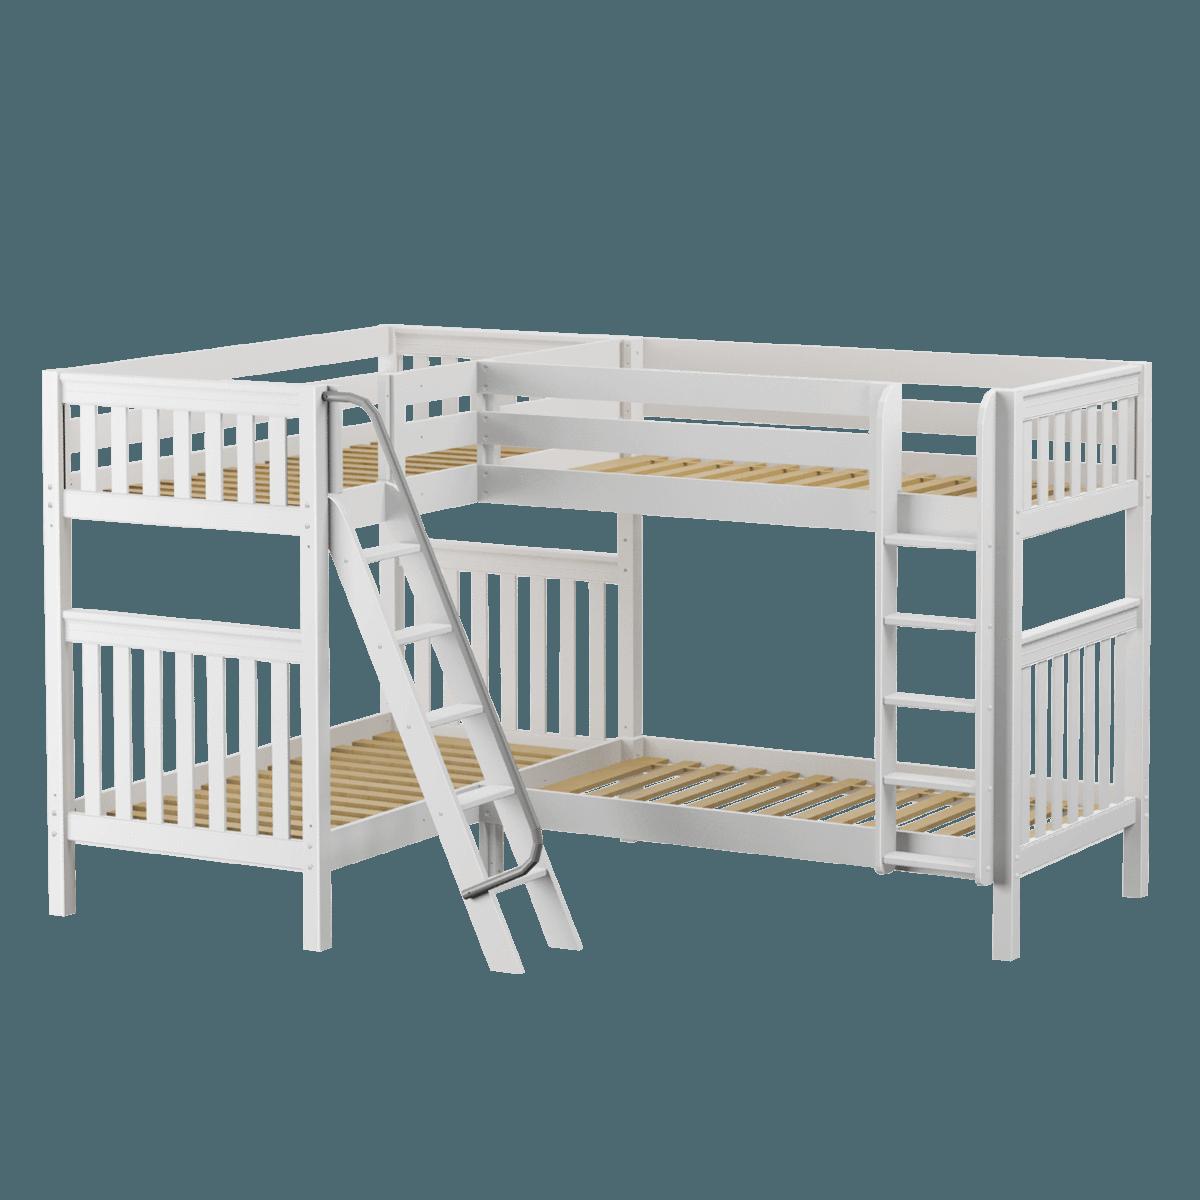 Twin High Corner Bunk Bed Bunk Beds Corner Bunk Beds Bunk Beds For Boys Room